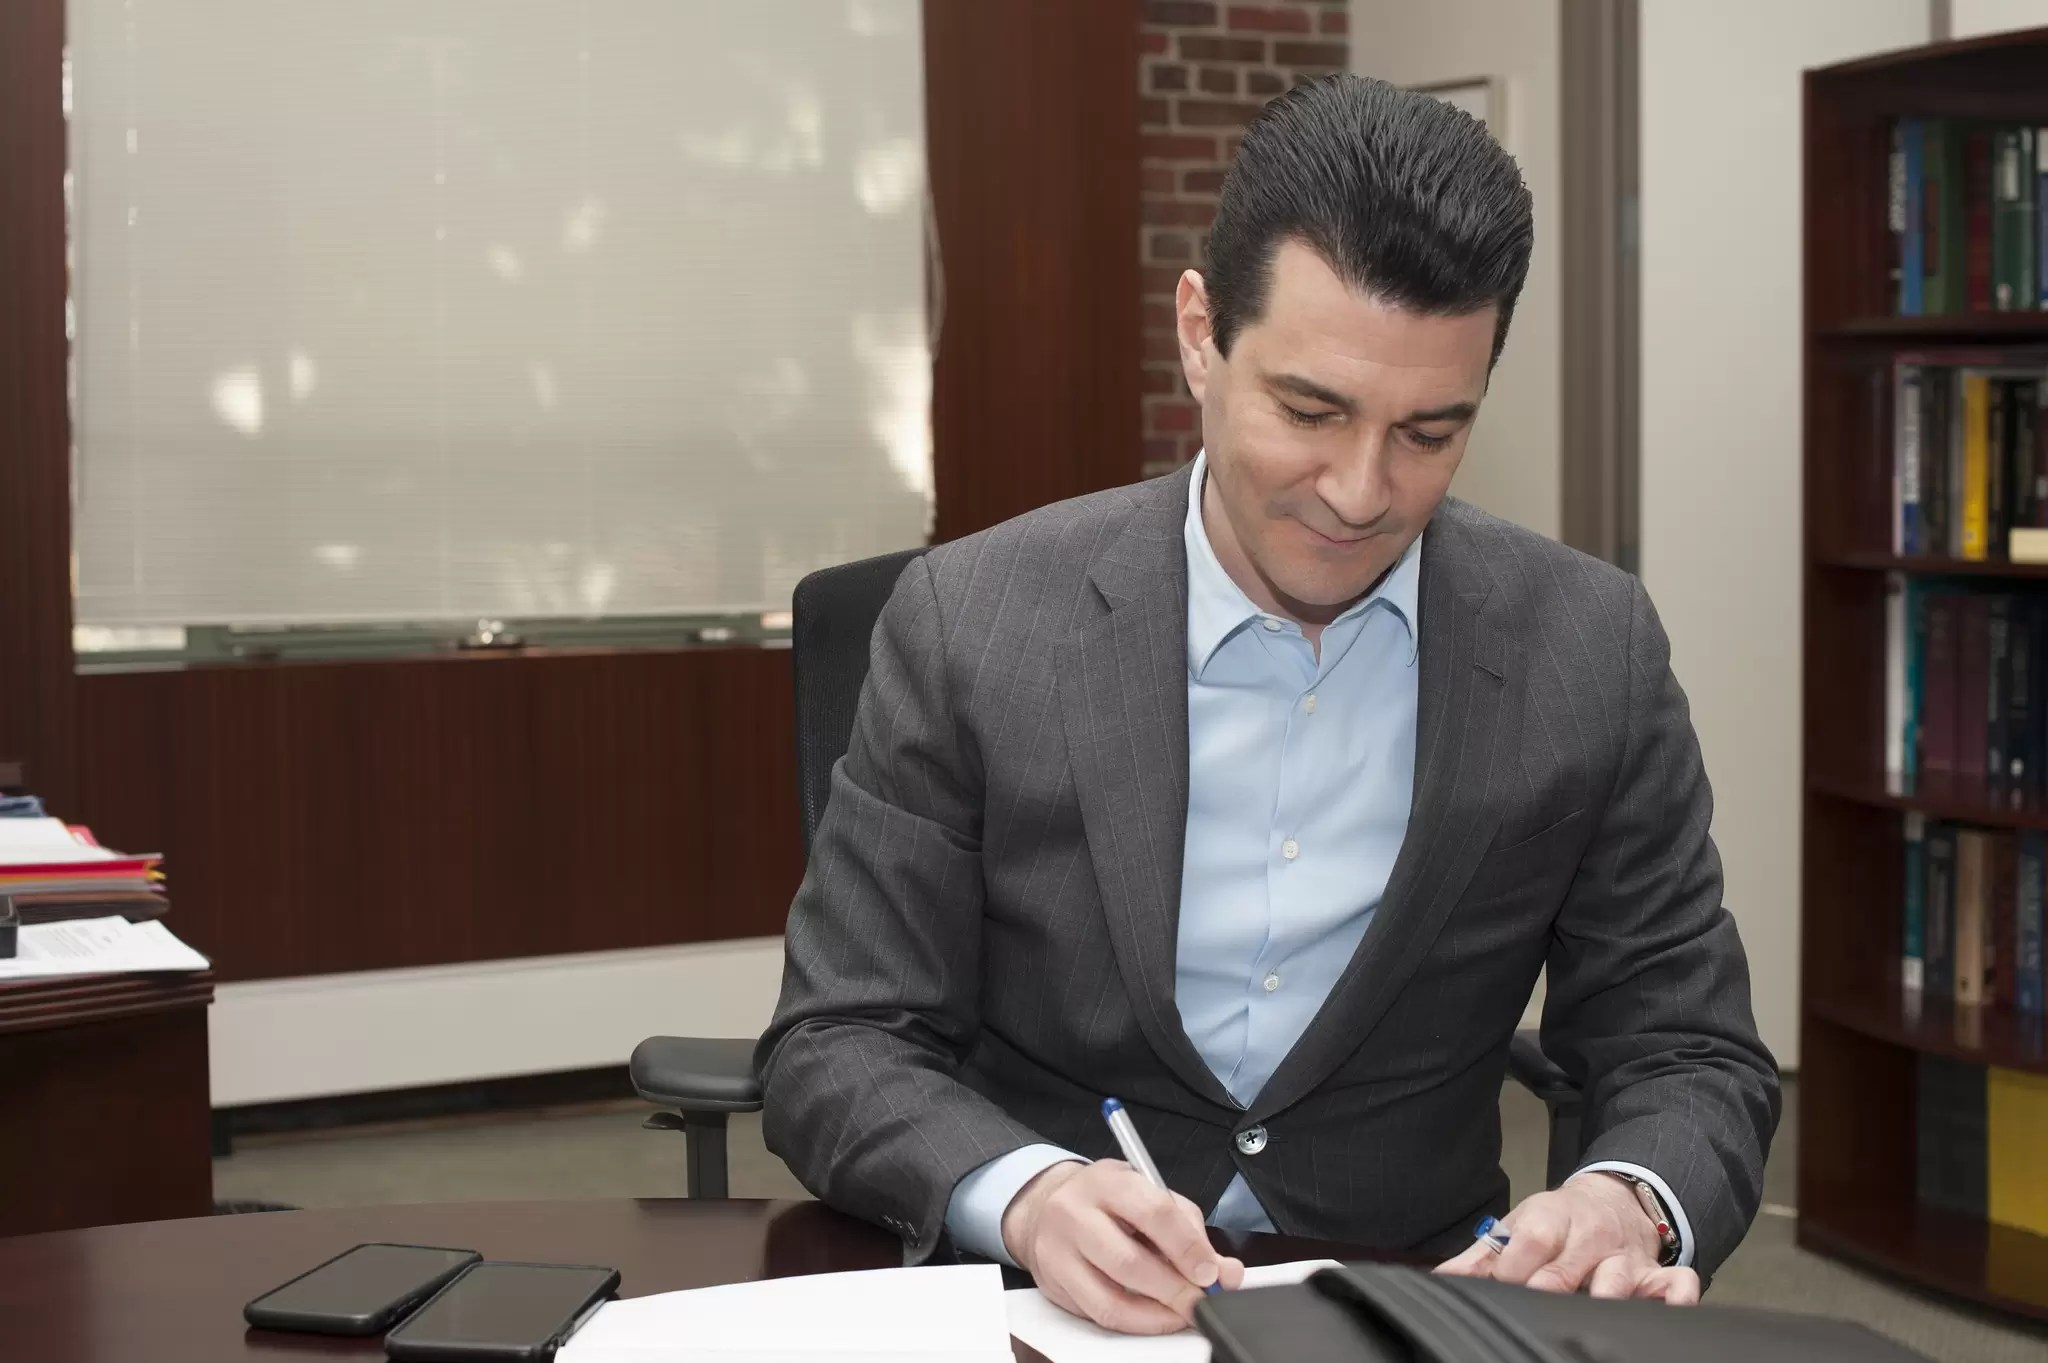 Gottlieb lands Big Pharma job